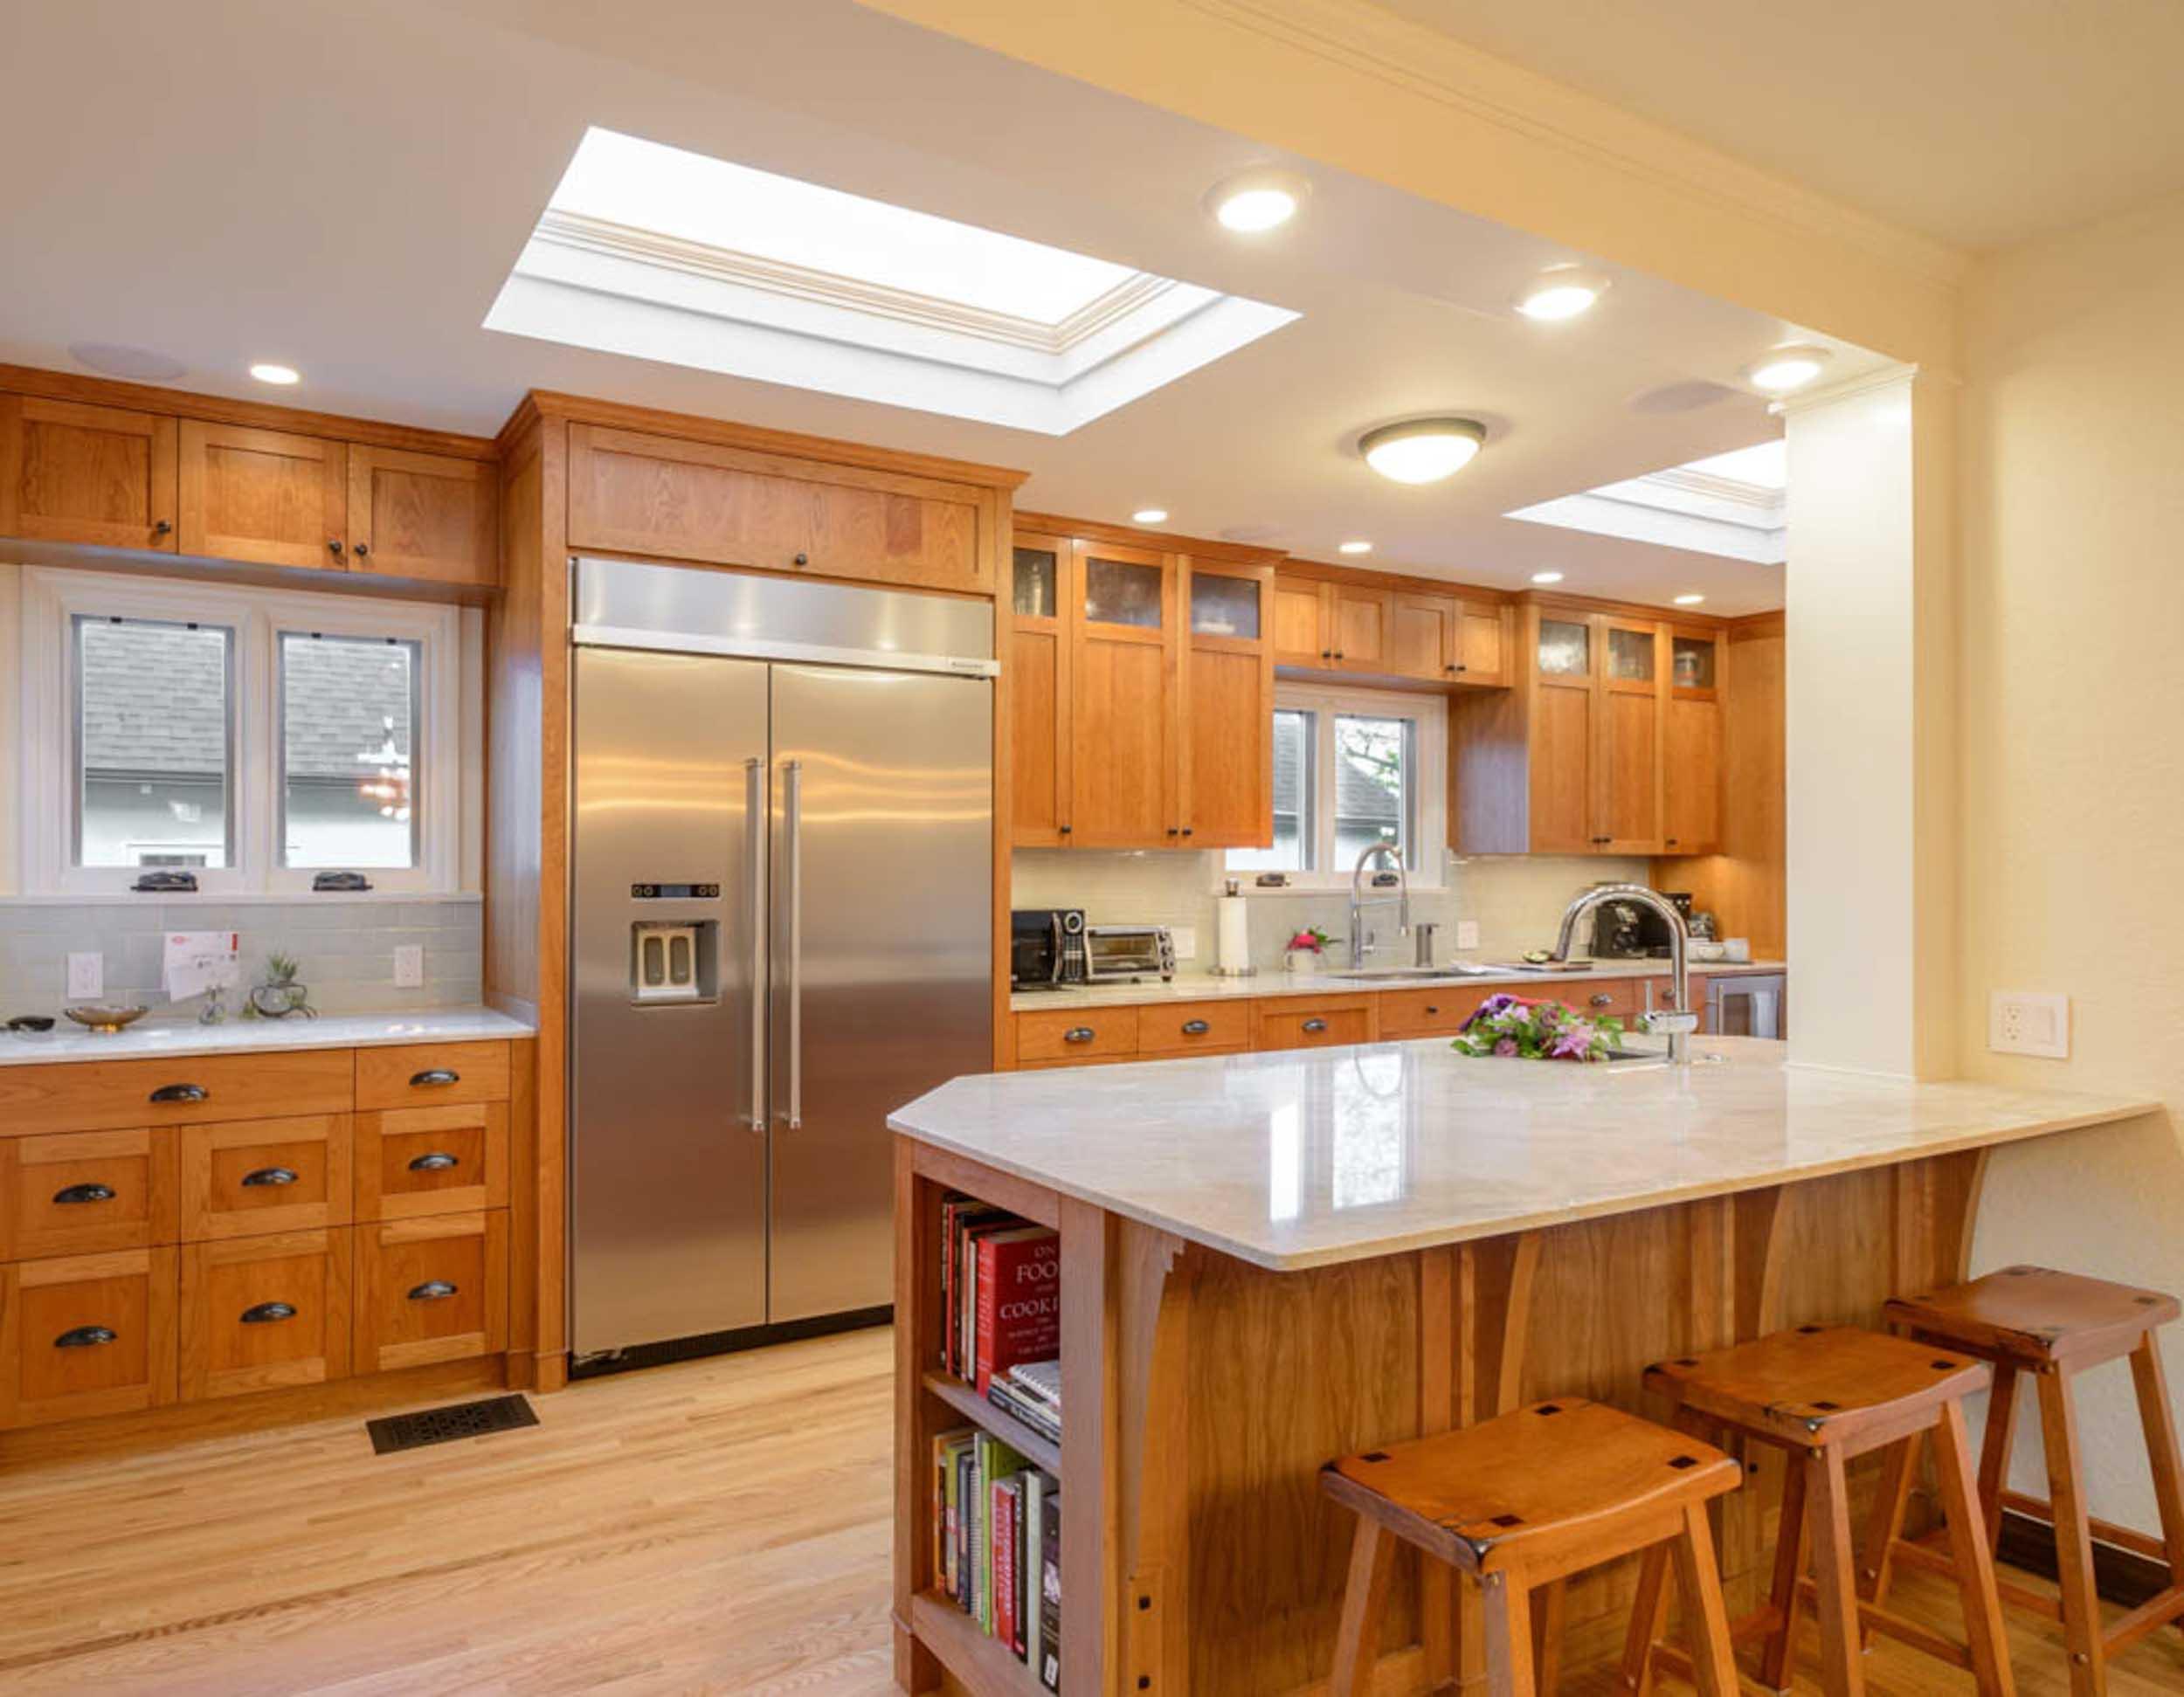 Tudor Kitchen with skylights